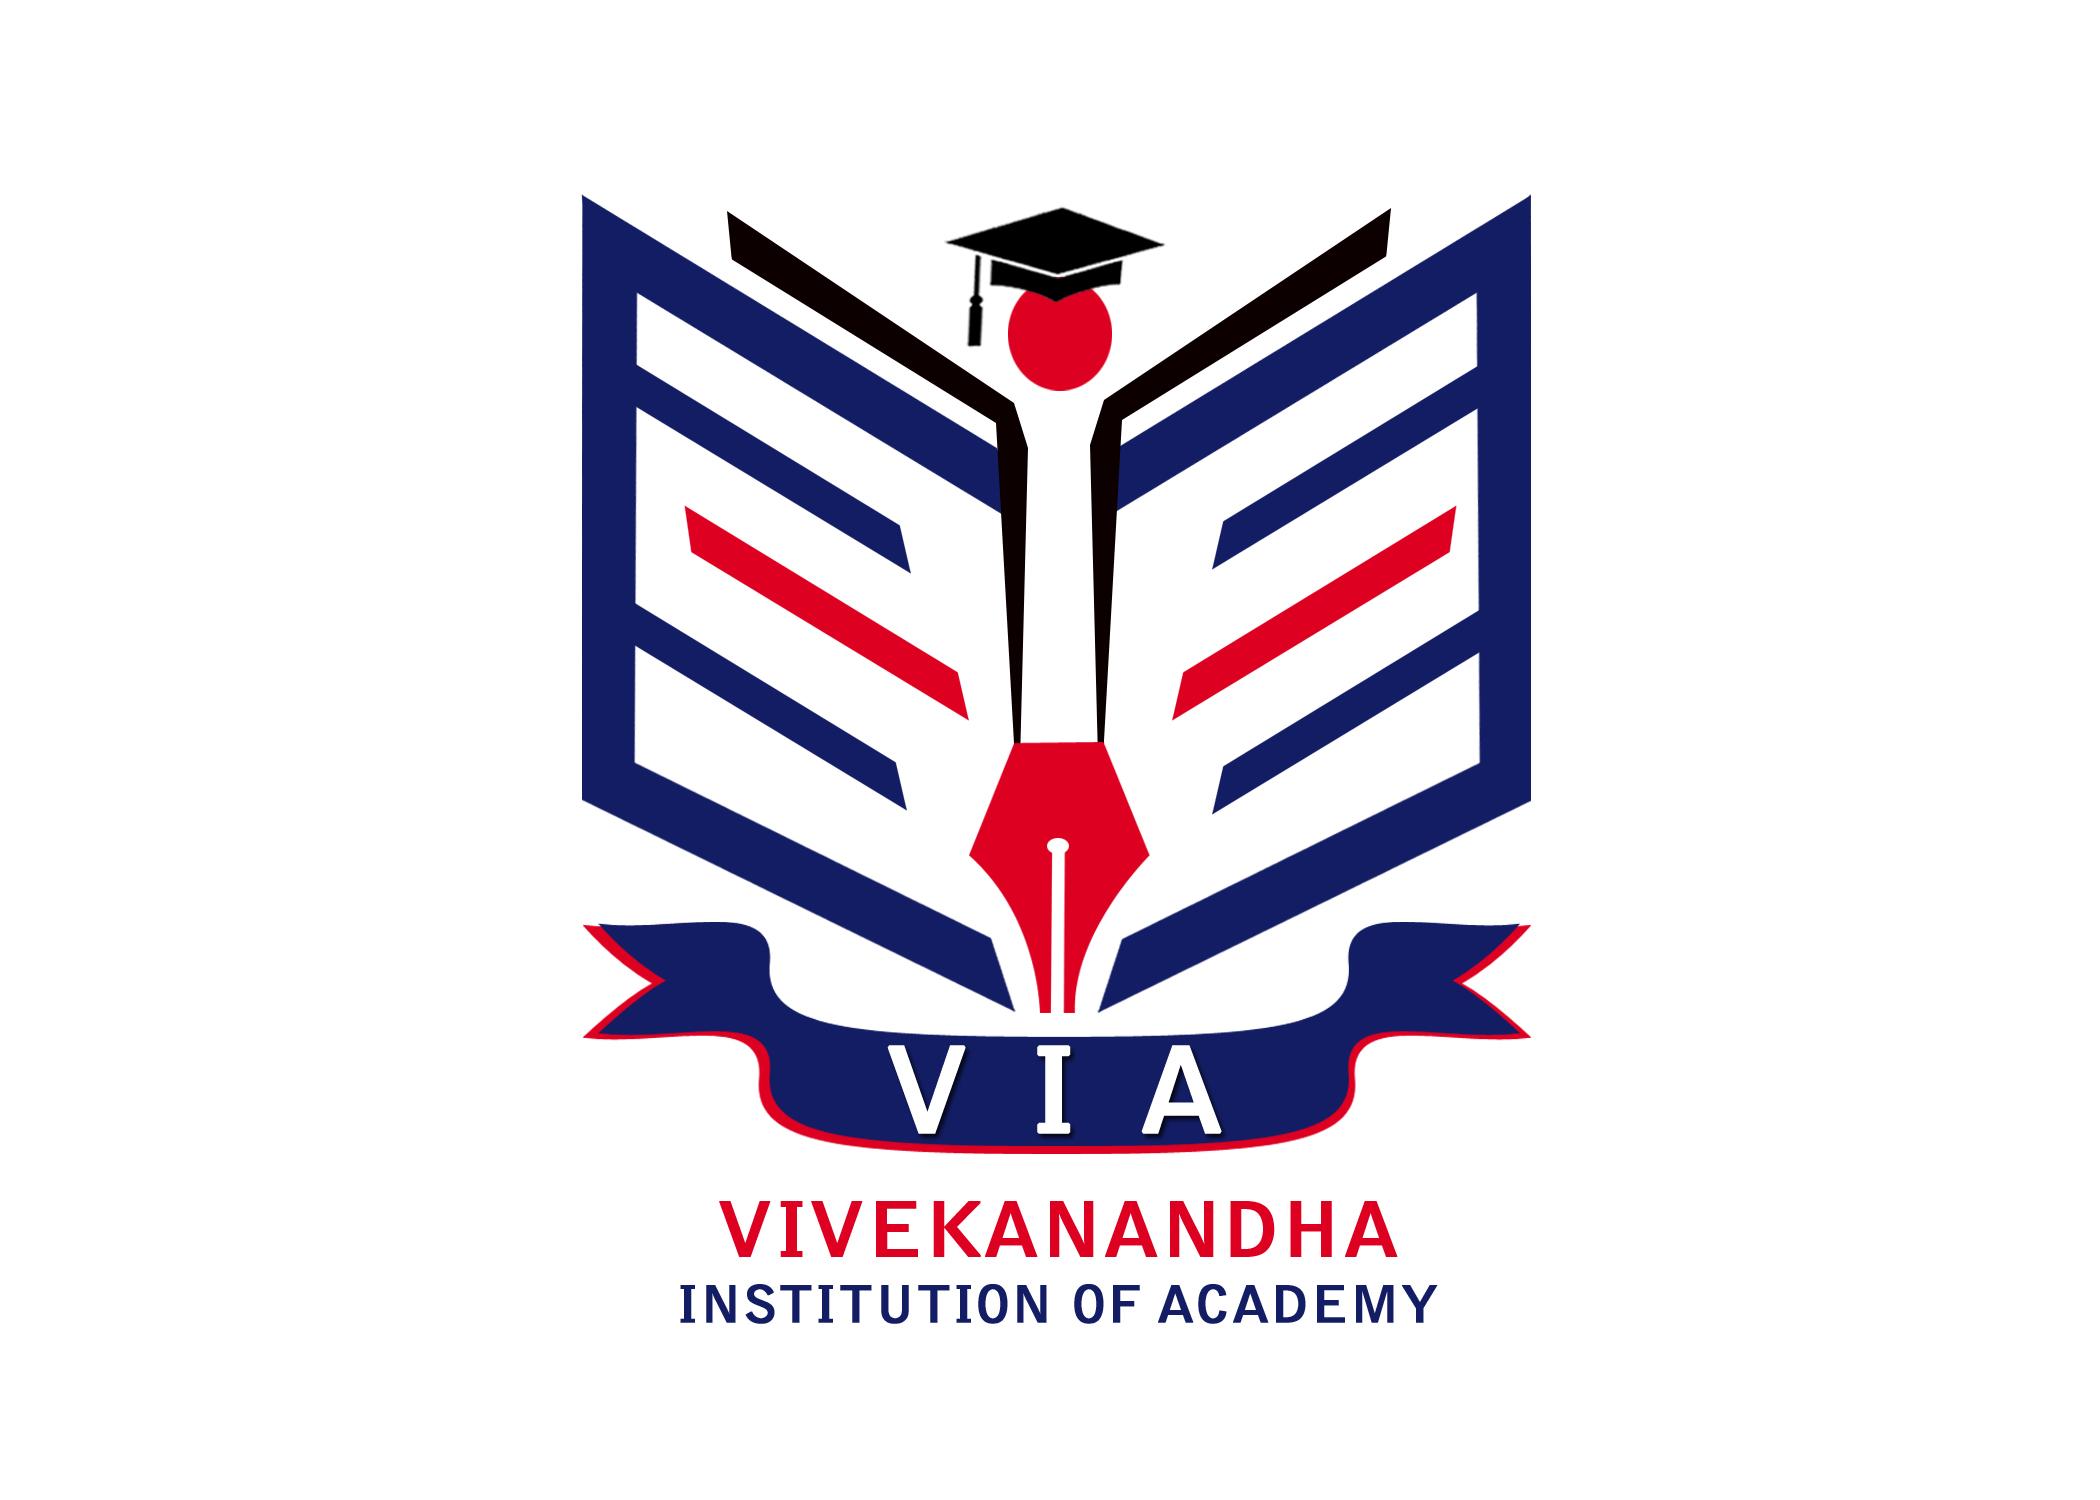 Vivekanandha Institution of Academy